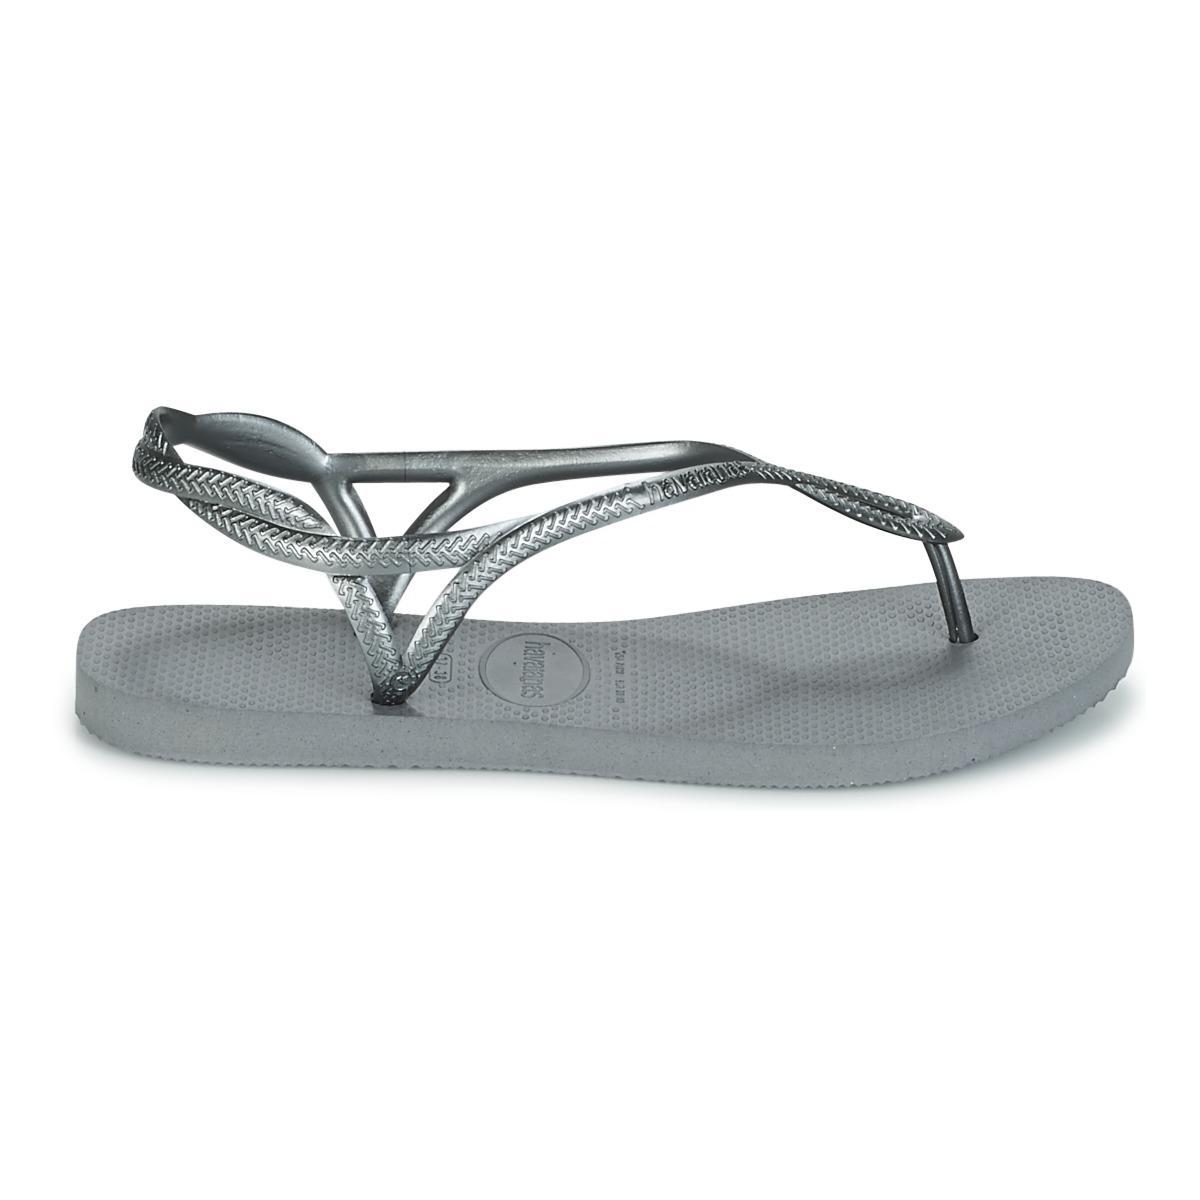 94efb7879e5cc1 Havaianas - Metallic Luna Women s Flip Flops   Sandals (shoes) In Silver -  Lyst. View fullscreen